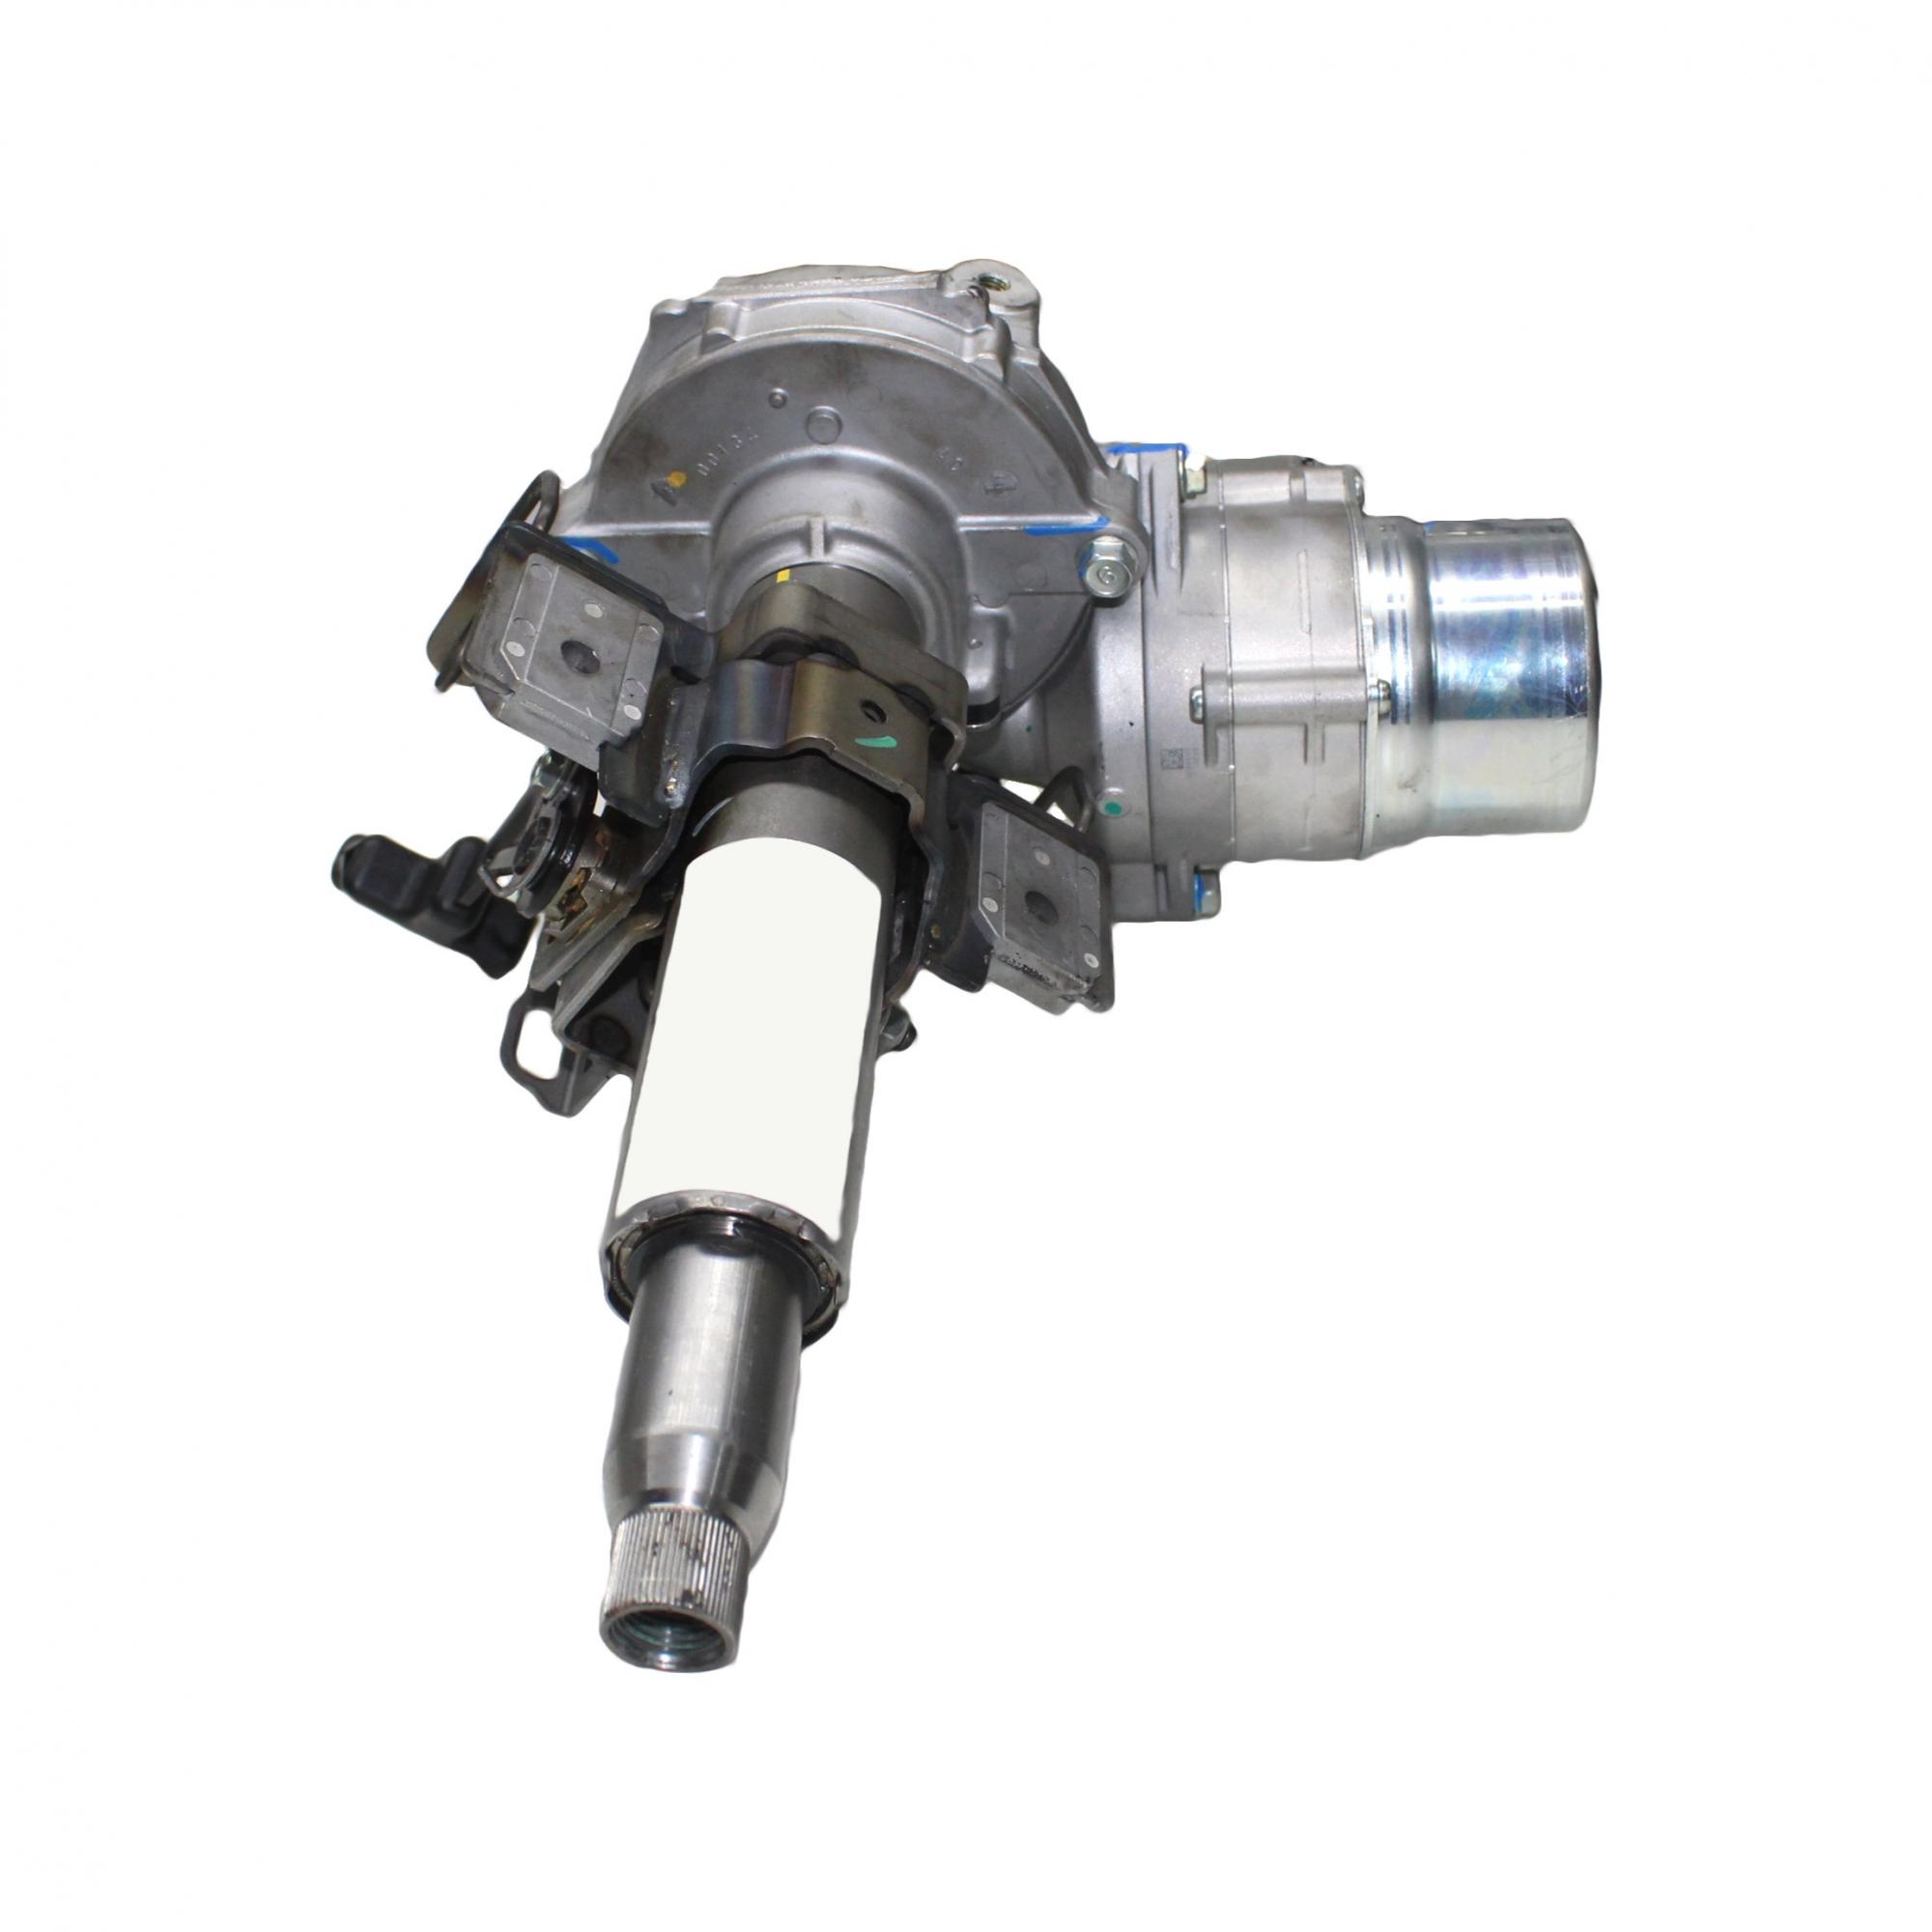 Motor Coluna Direção Elétrica Honda Fit 18..., WRV 18..., HRV 18... 53211T5NB11